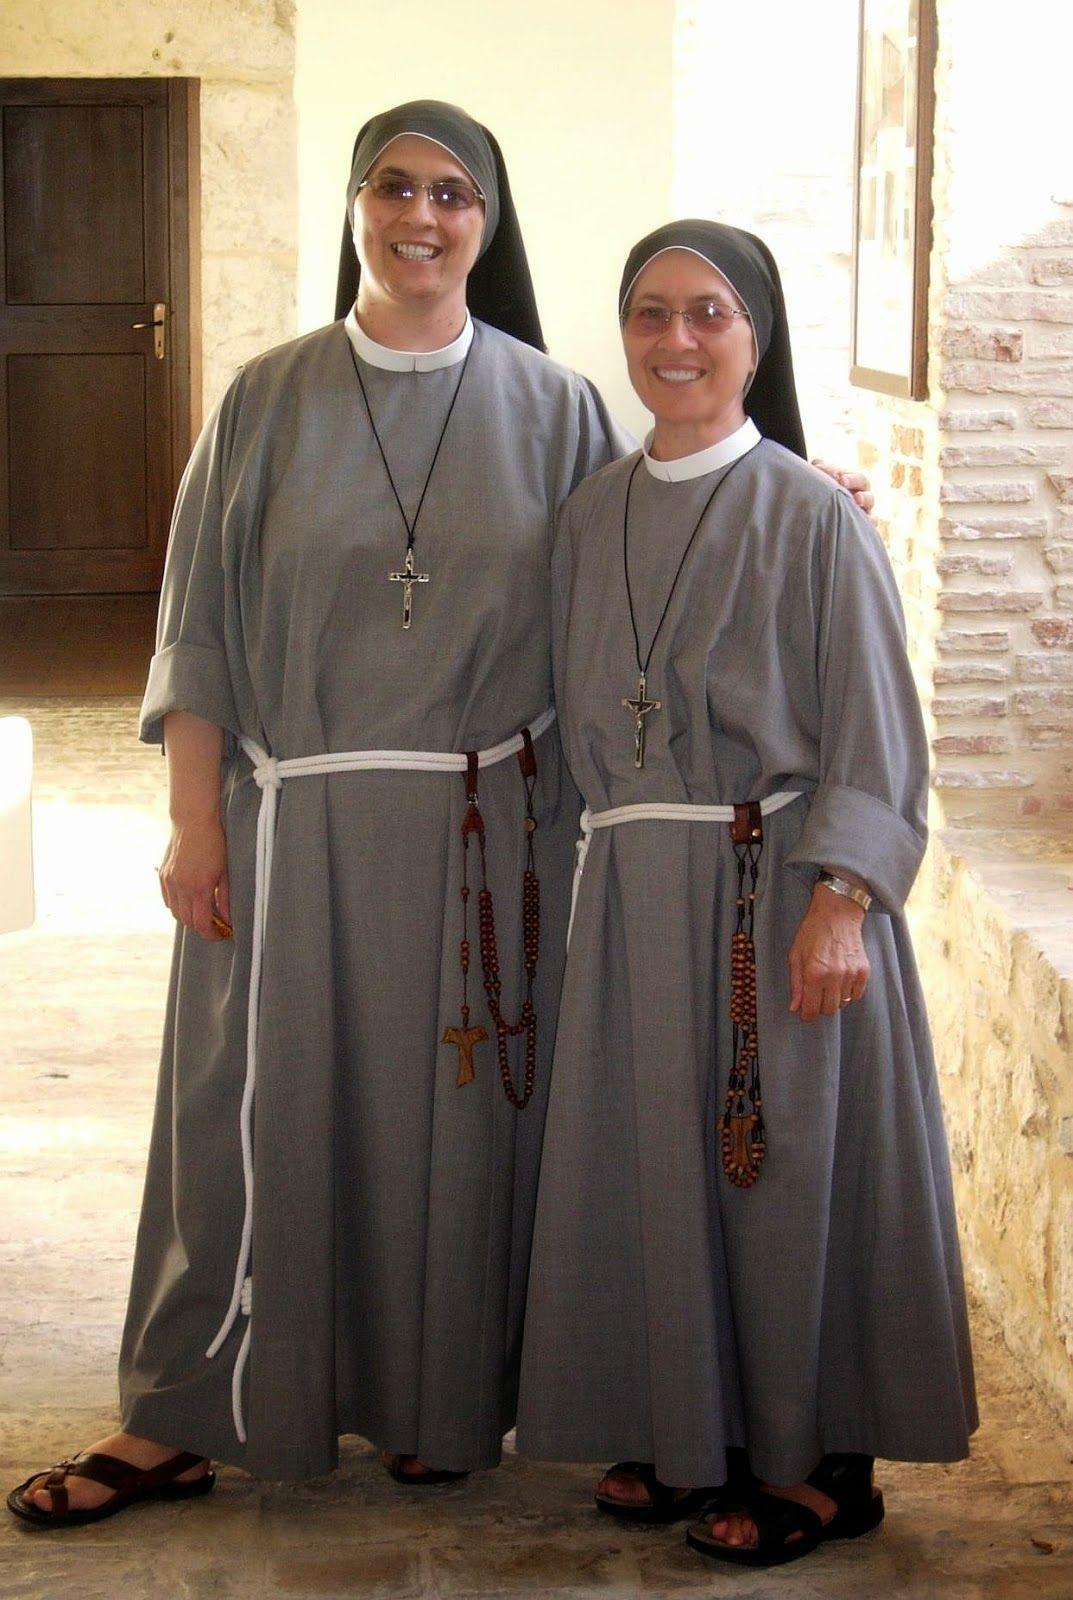 Franciscan Sisters Of Love Nun Dress Women Sisters